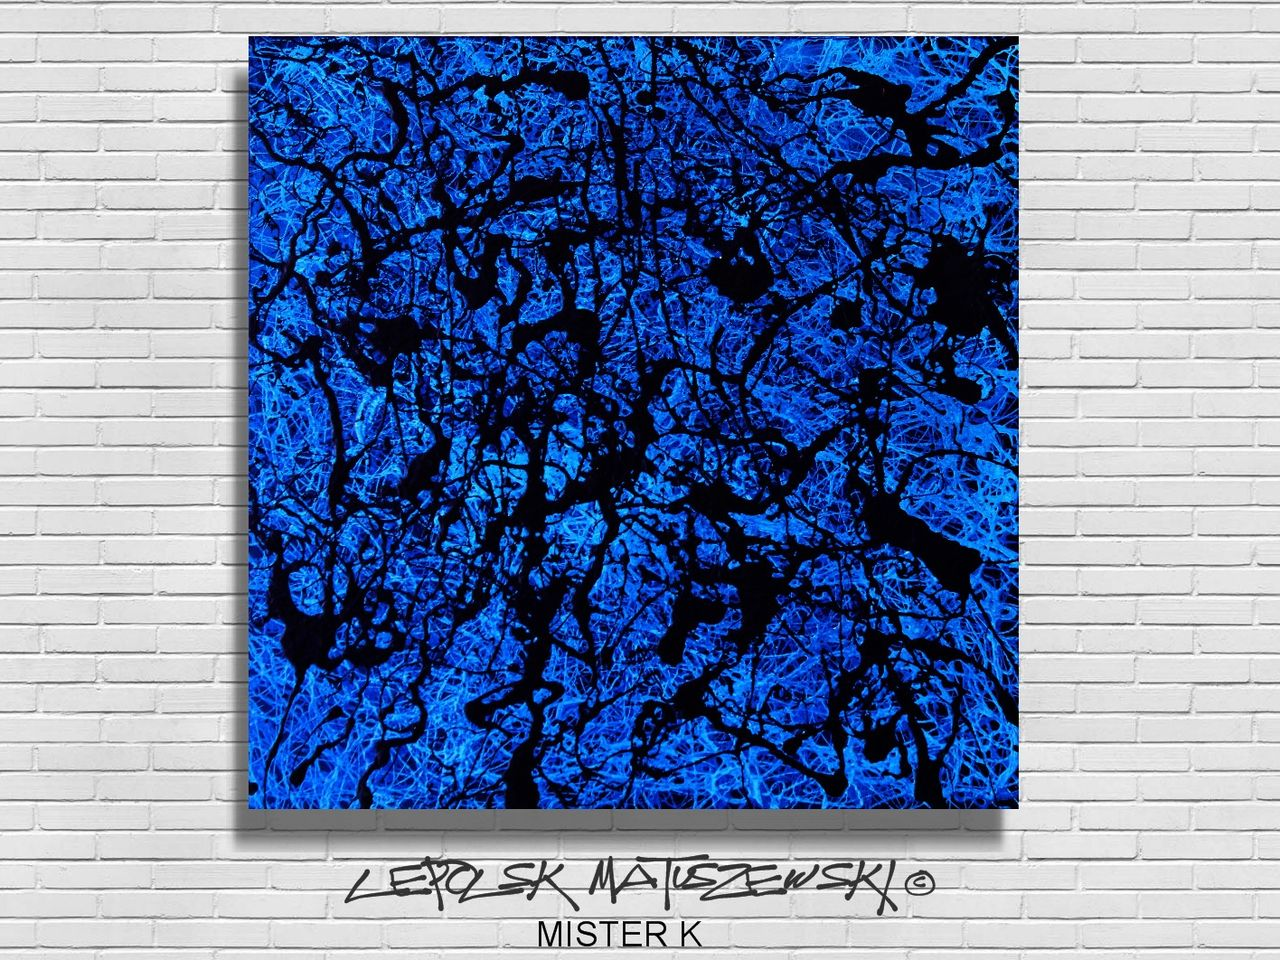 MISTER K  (Lepolsk Matuszewski) BLUE RAIN  abstract Expressionnism  2015 Lepolsk